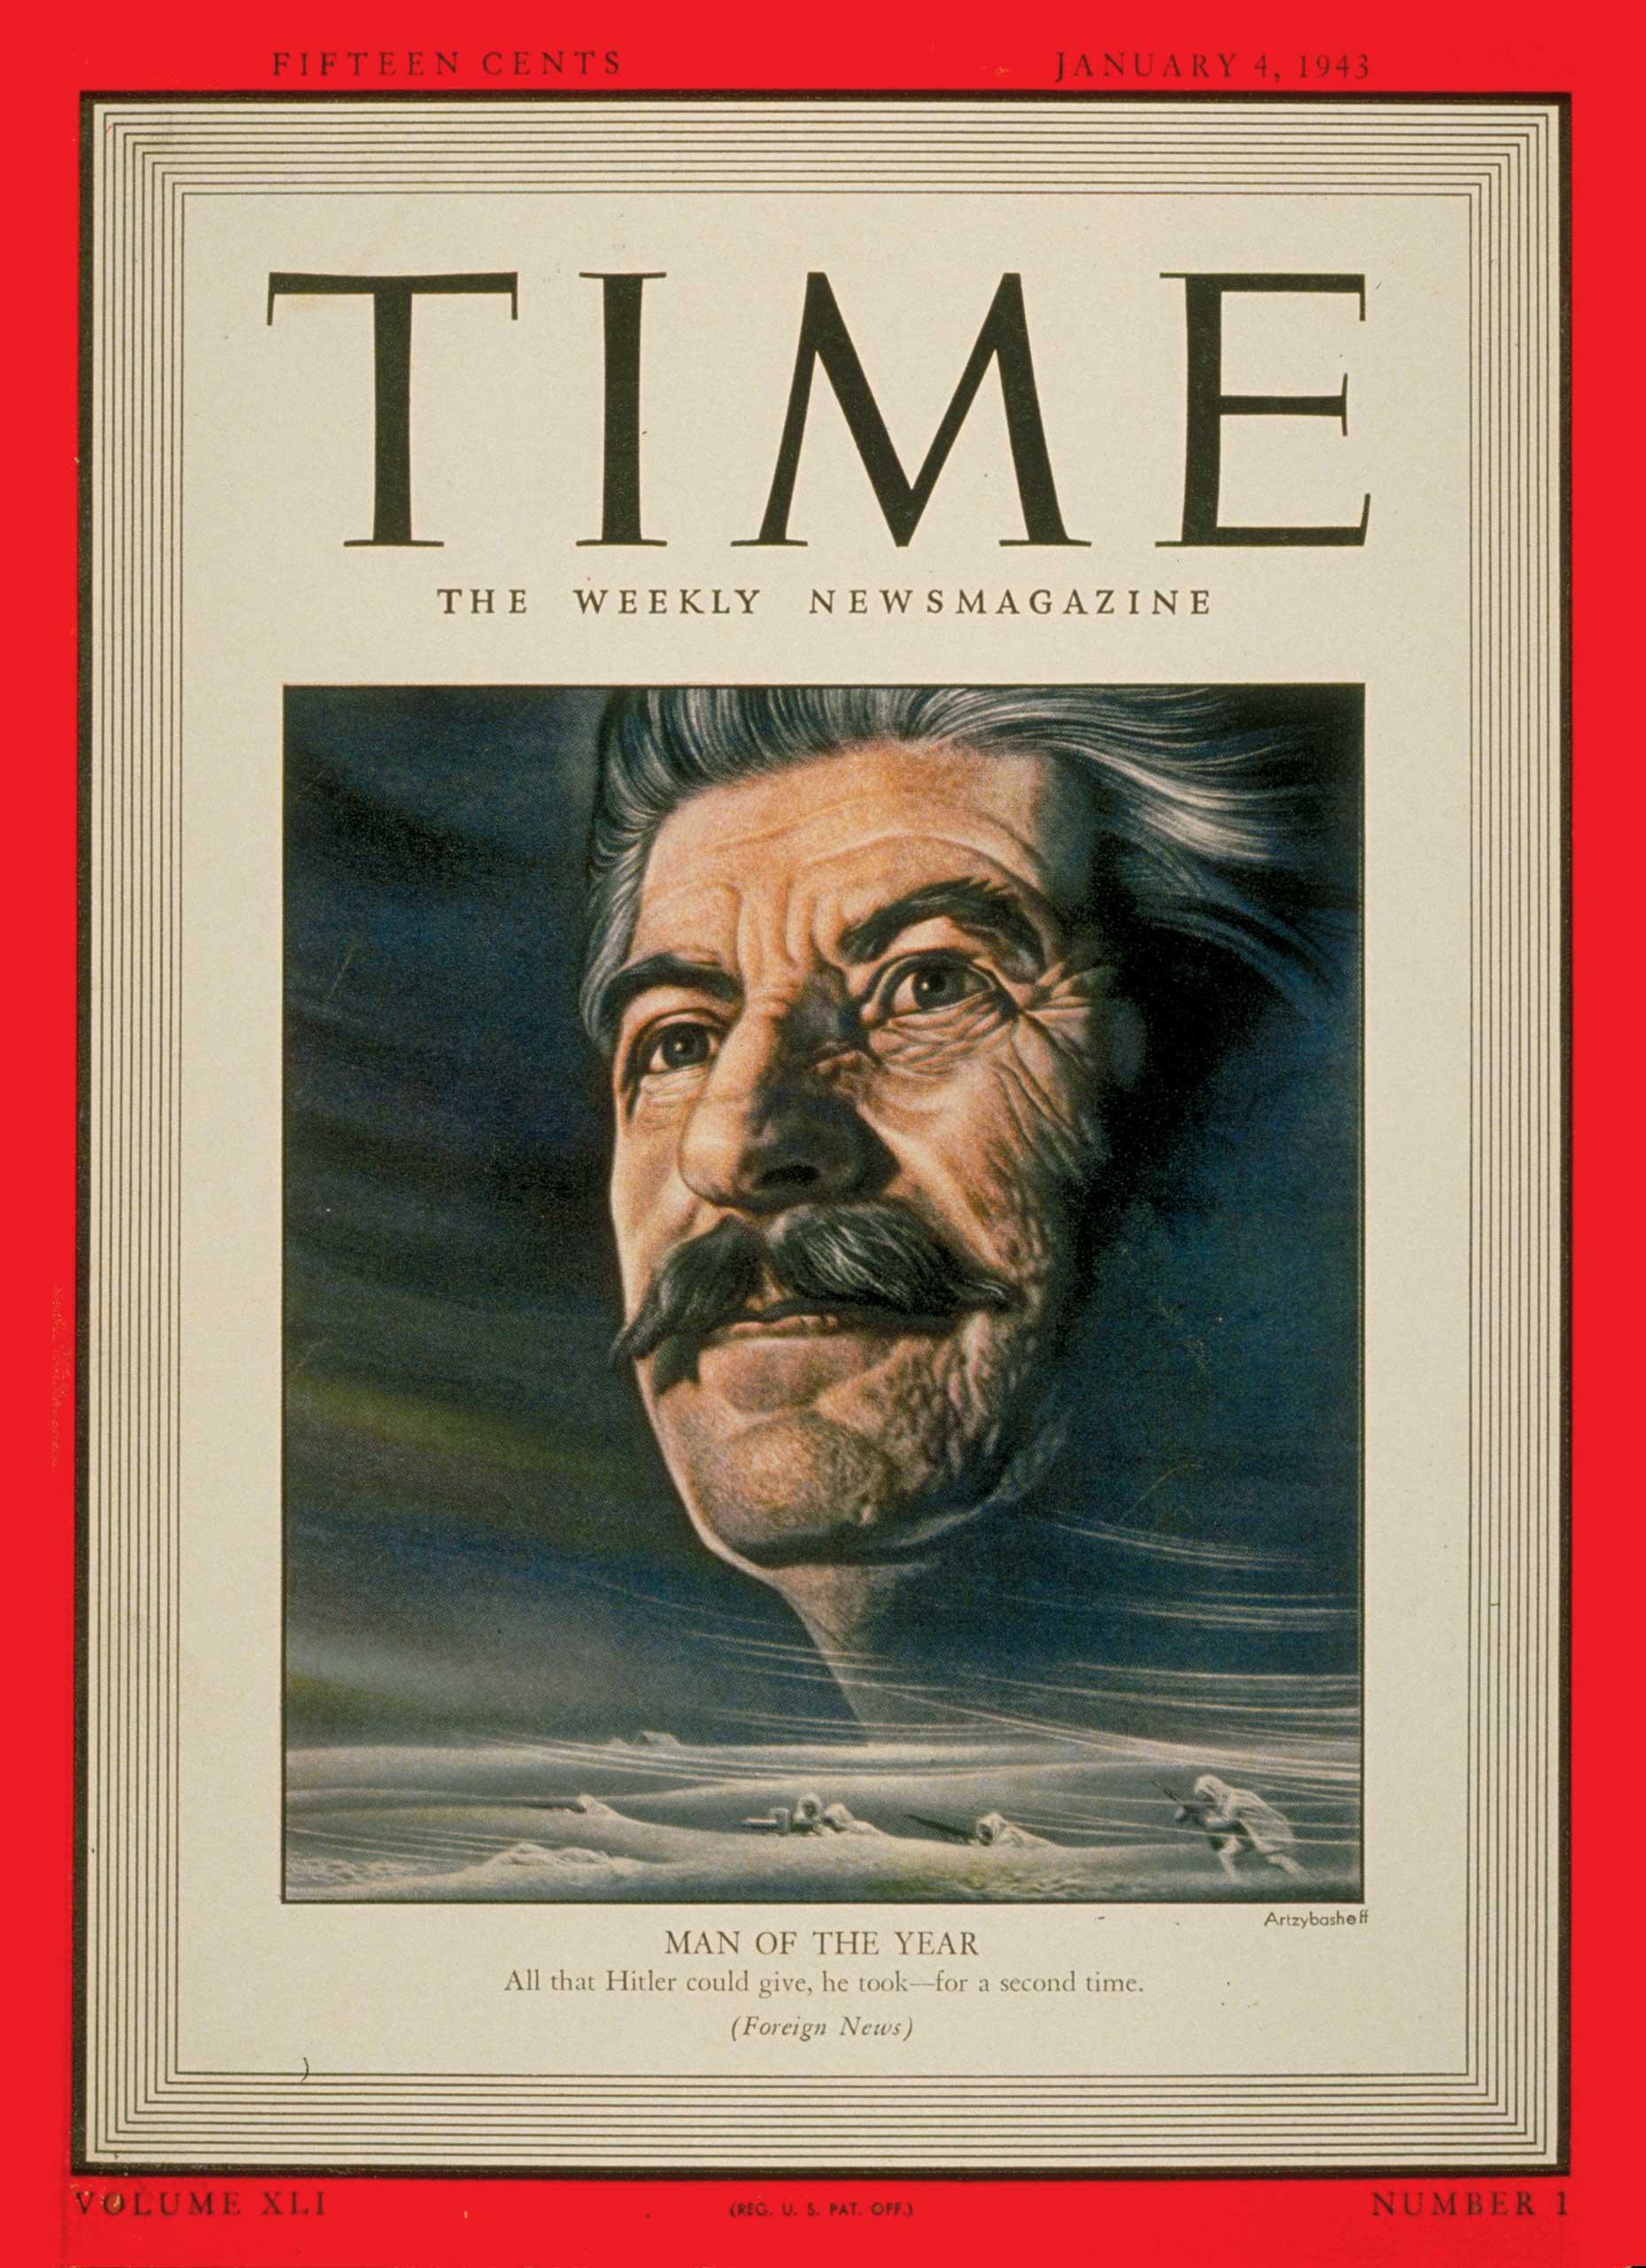 1942: Joseph Stalin